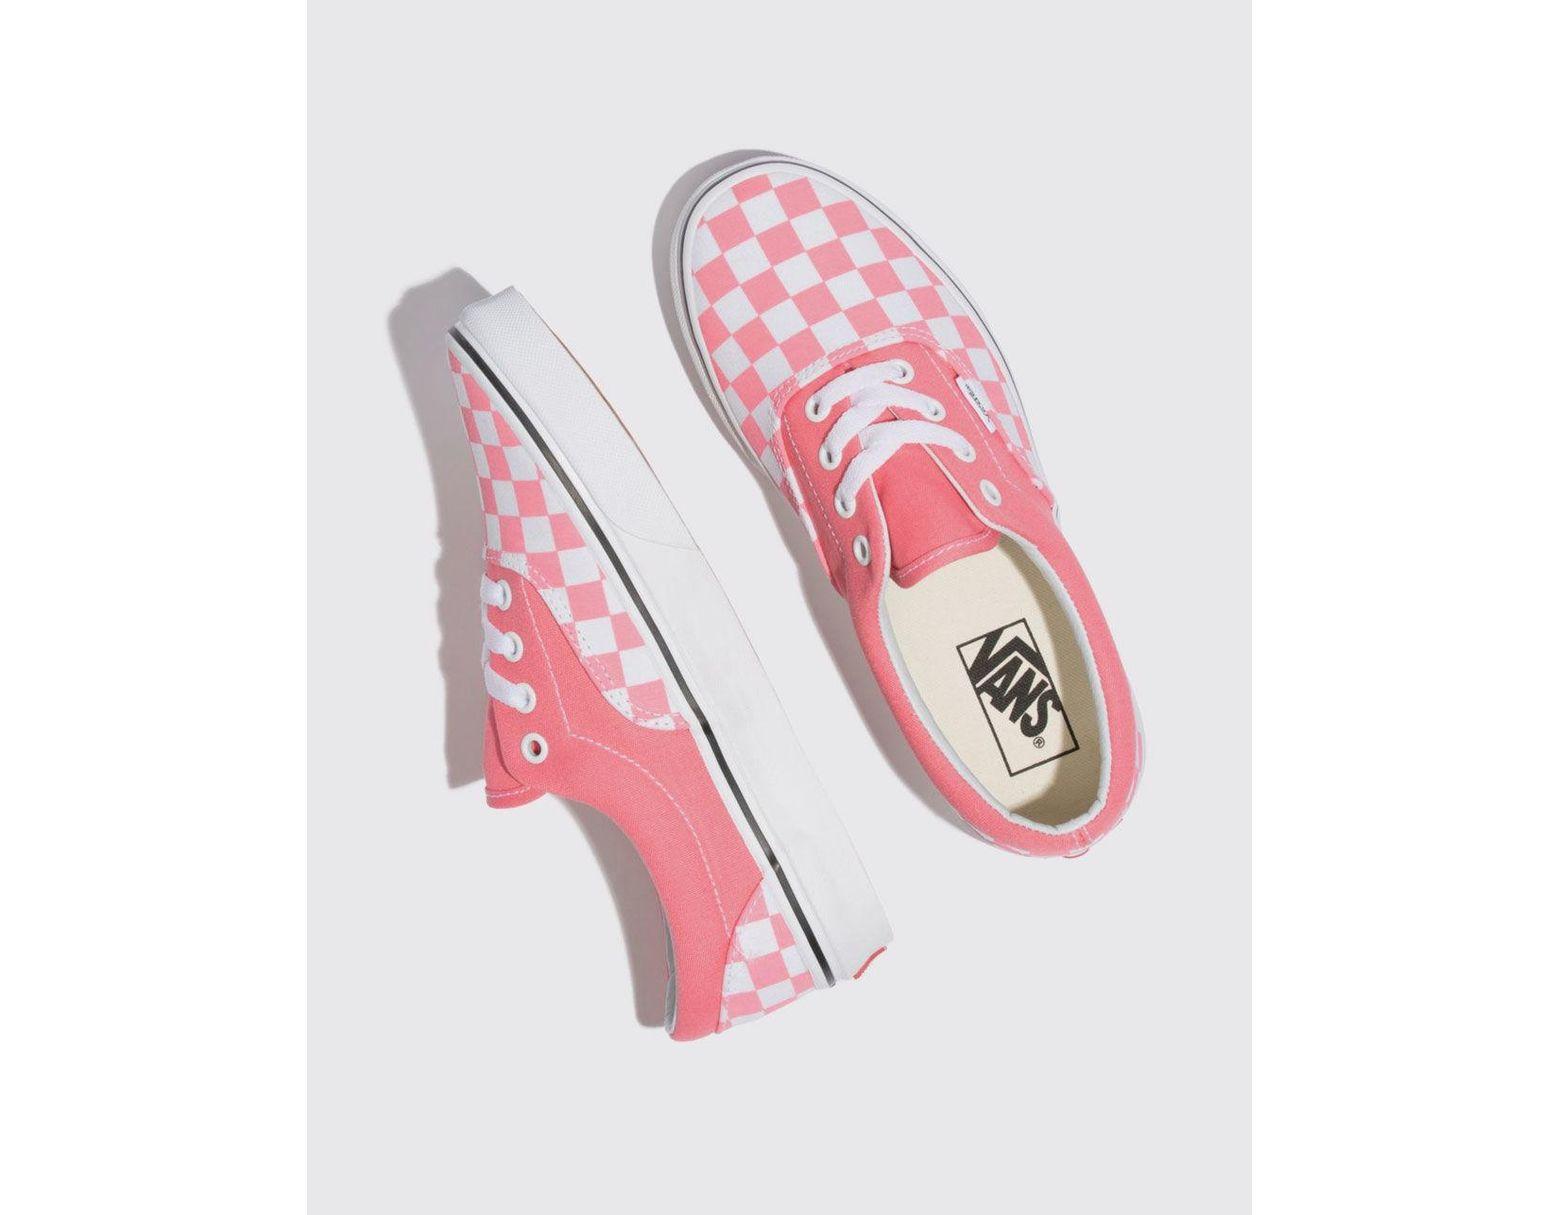 5a7a5f8a5c686 Vans Era (checkerboard) Strawberry - Save 33% - Lyst